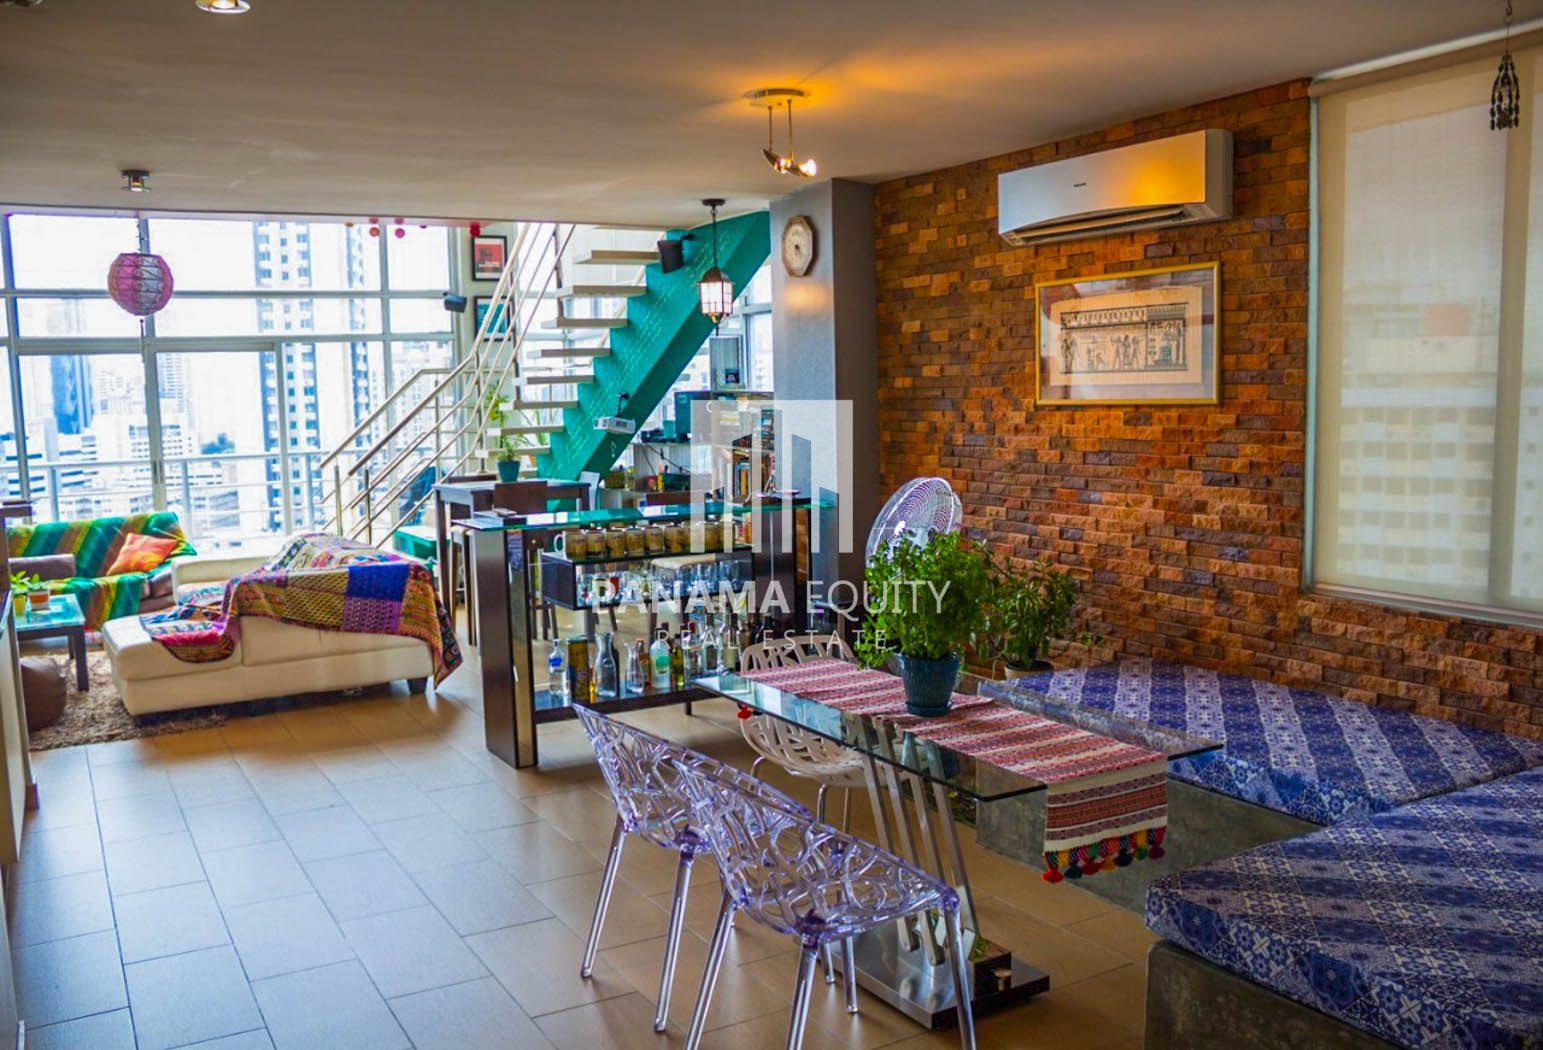 Modern and Trendy Loft in the Heart of El Cangrejo!